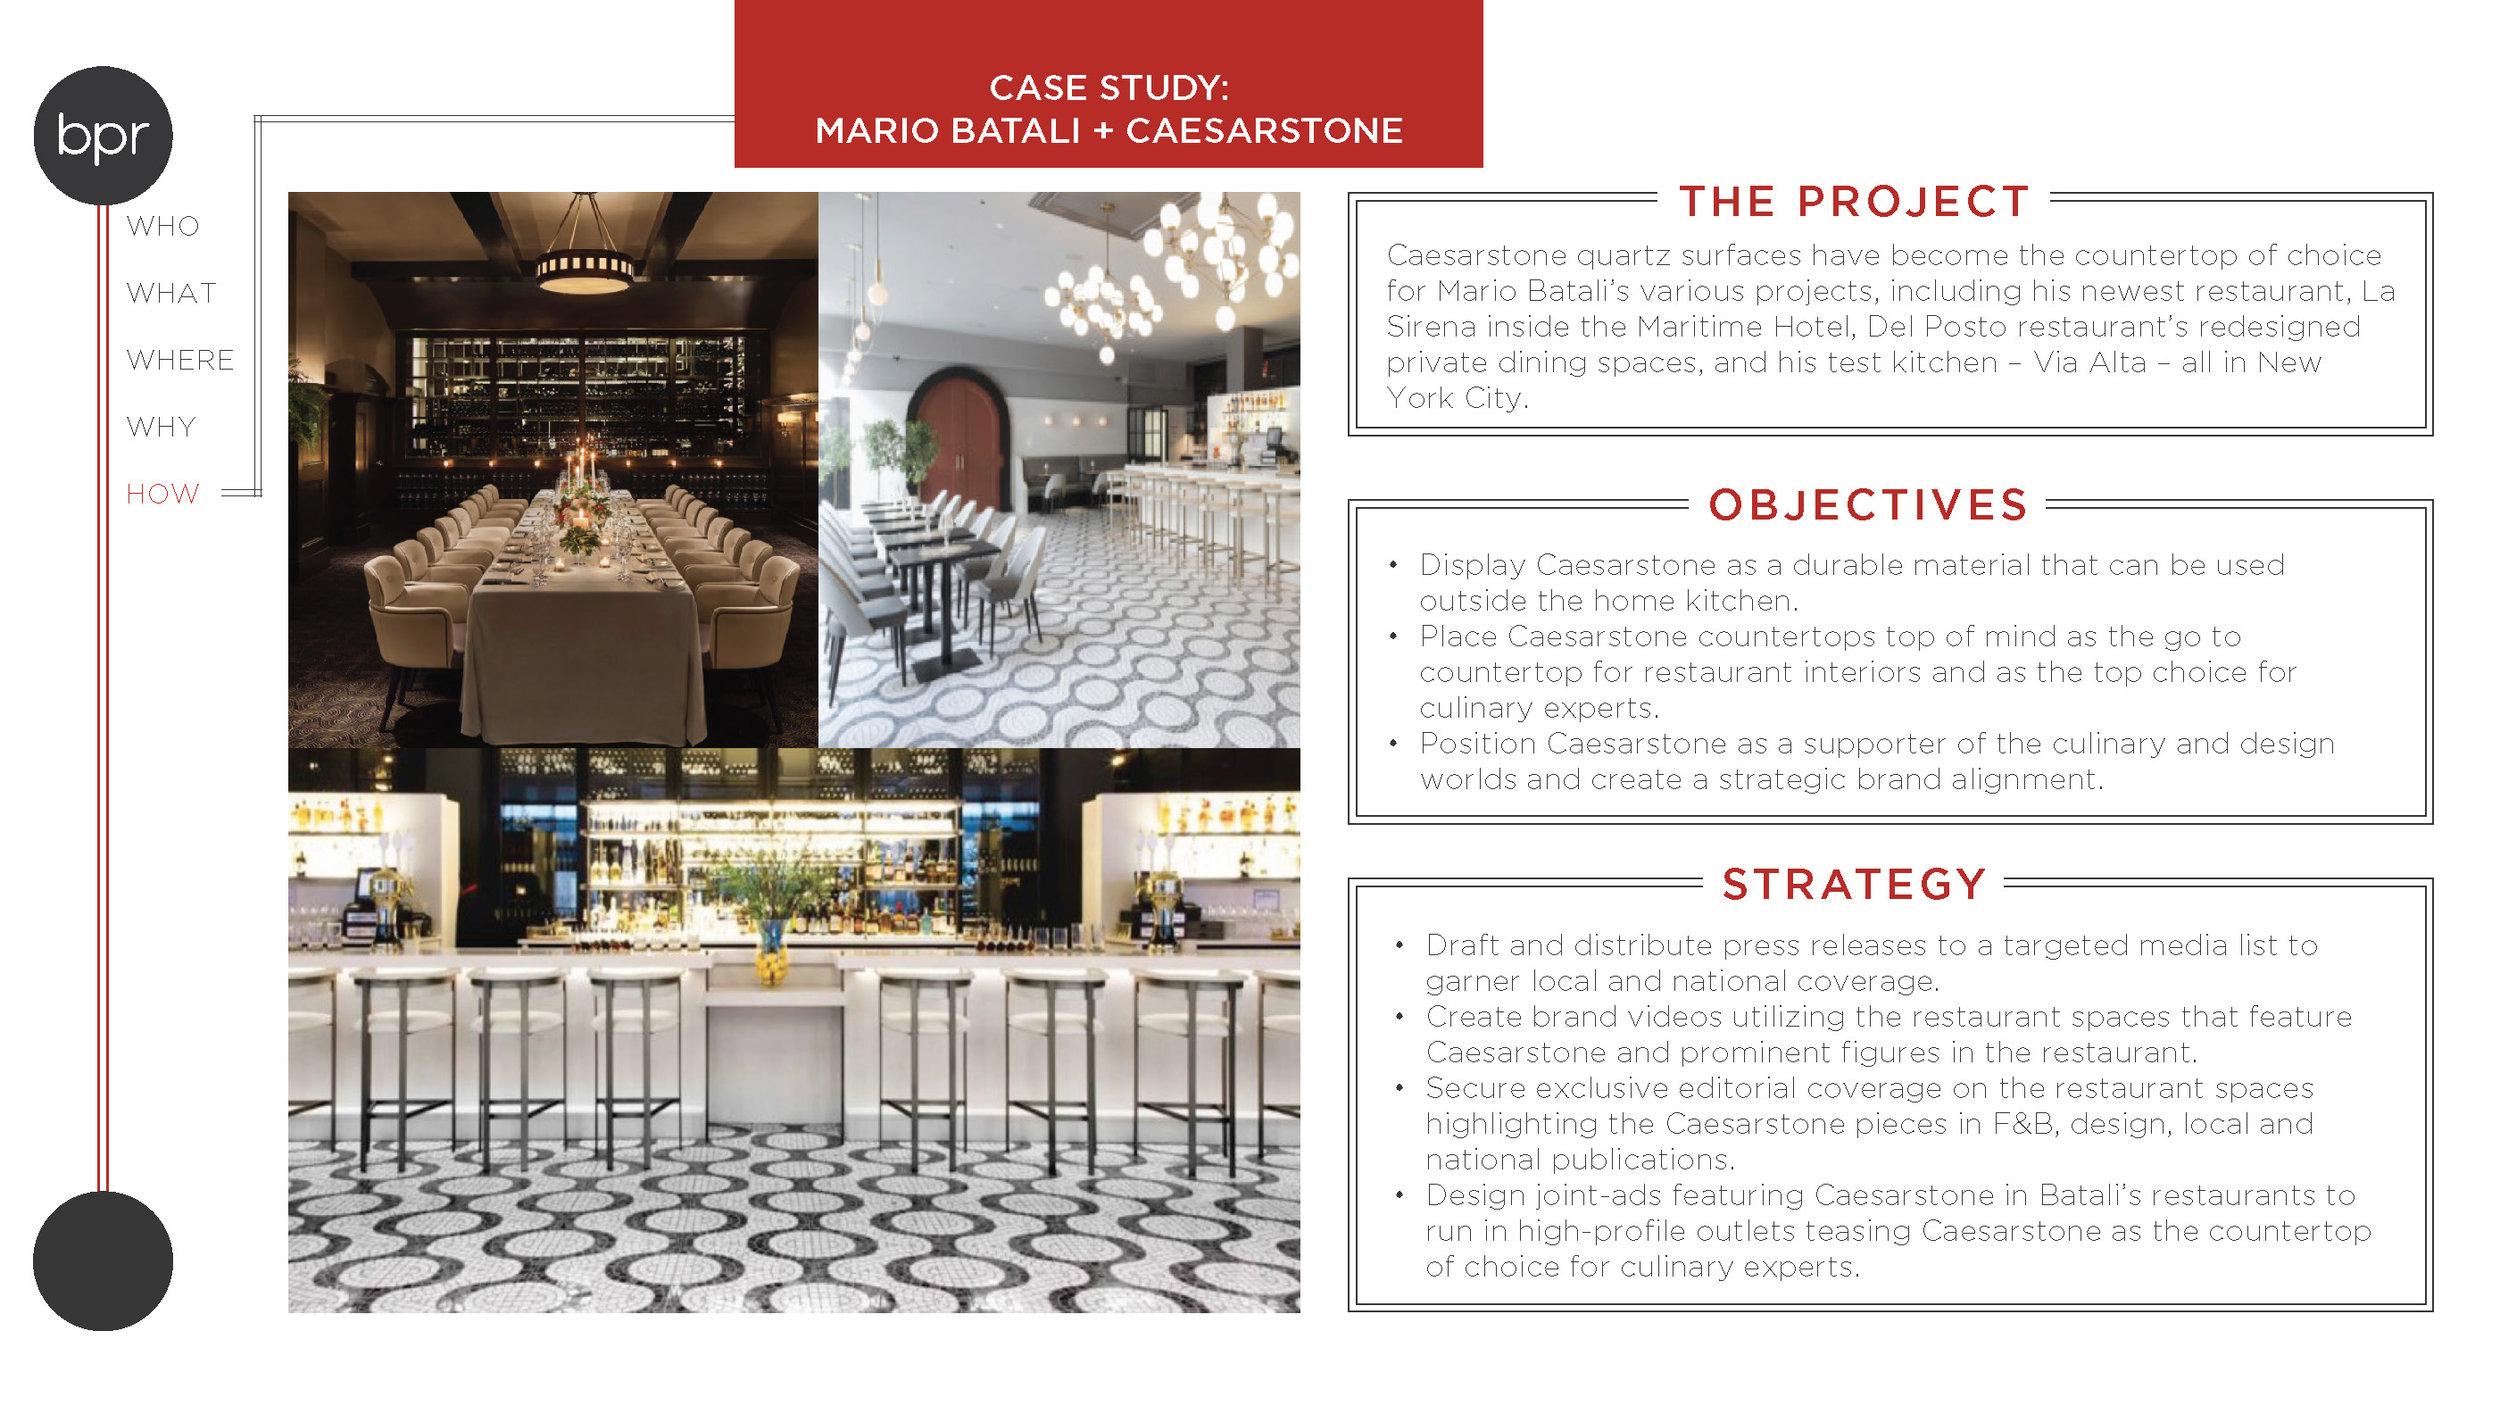 Caesarstone-Mario Batali Case Study_Page_2.jpg